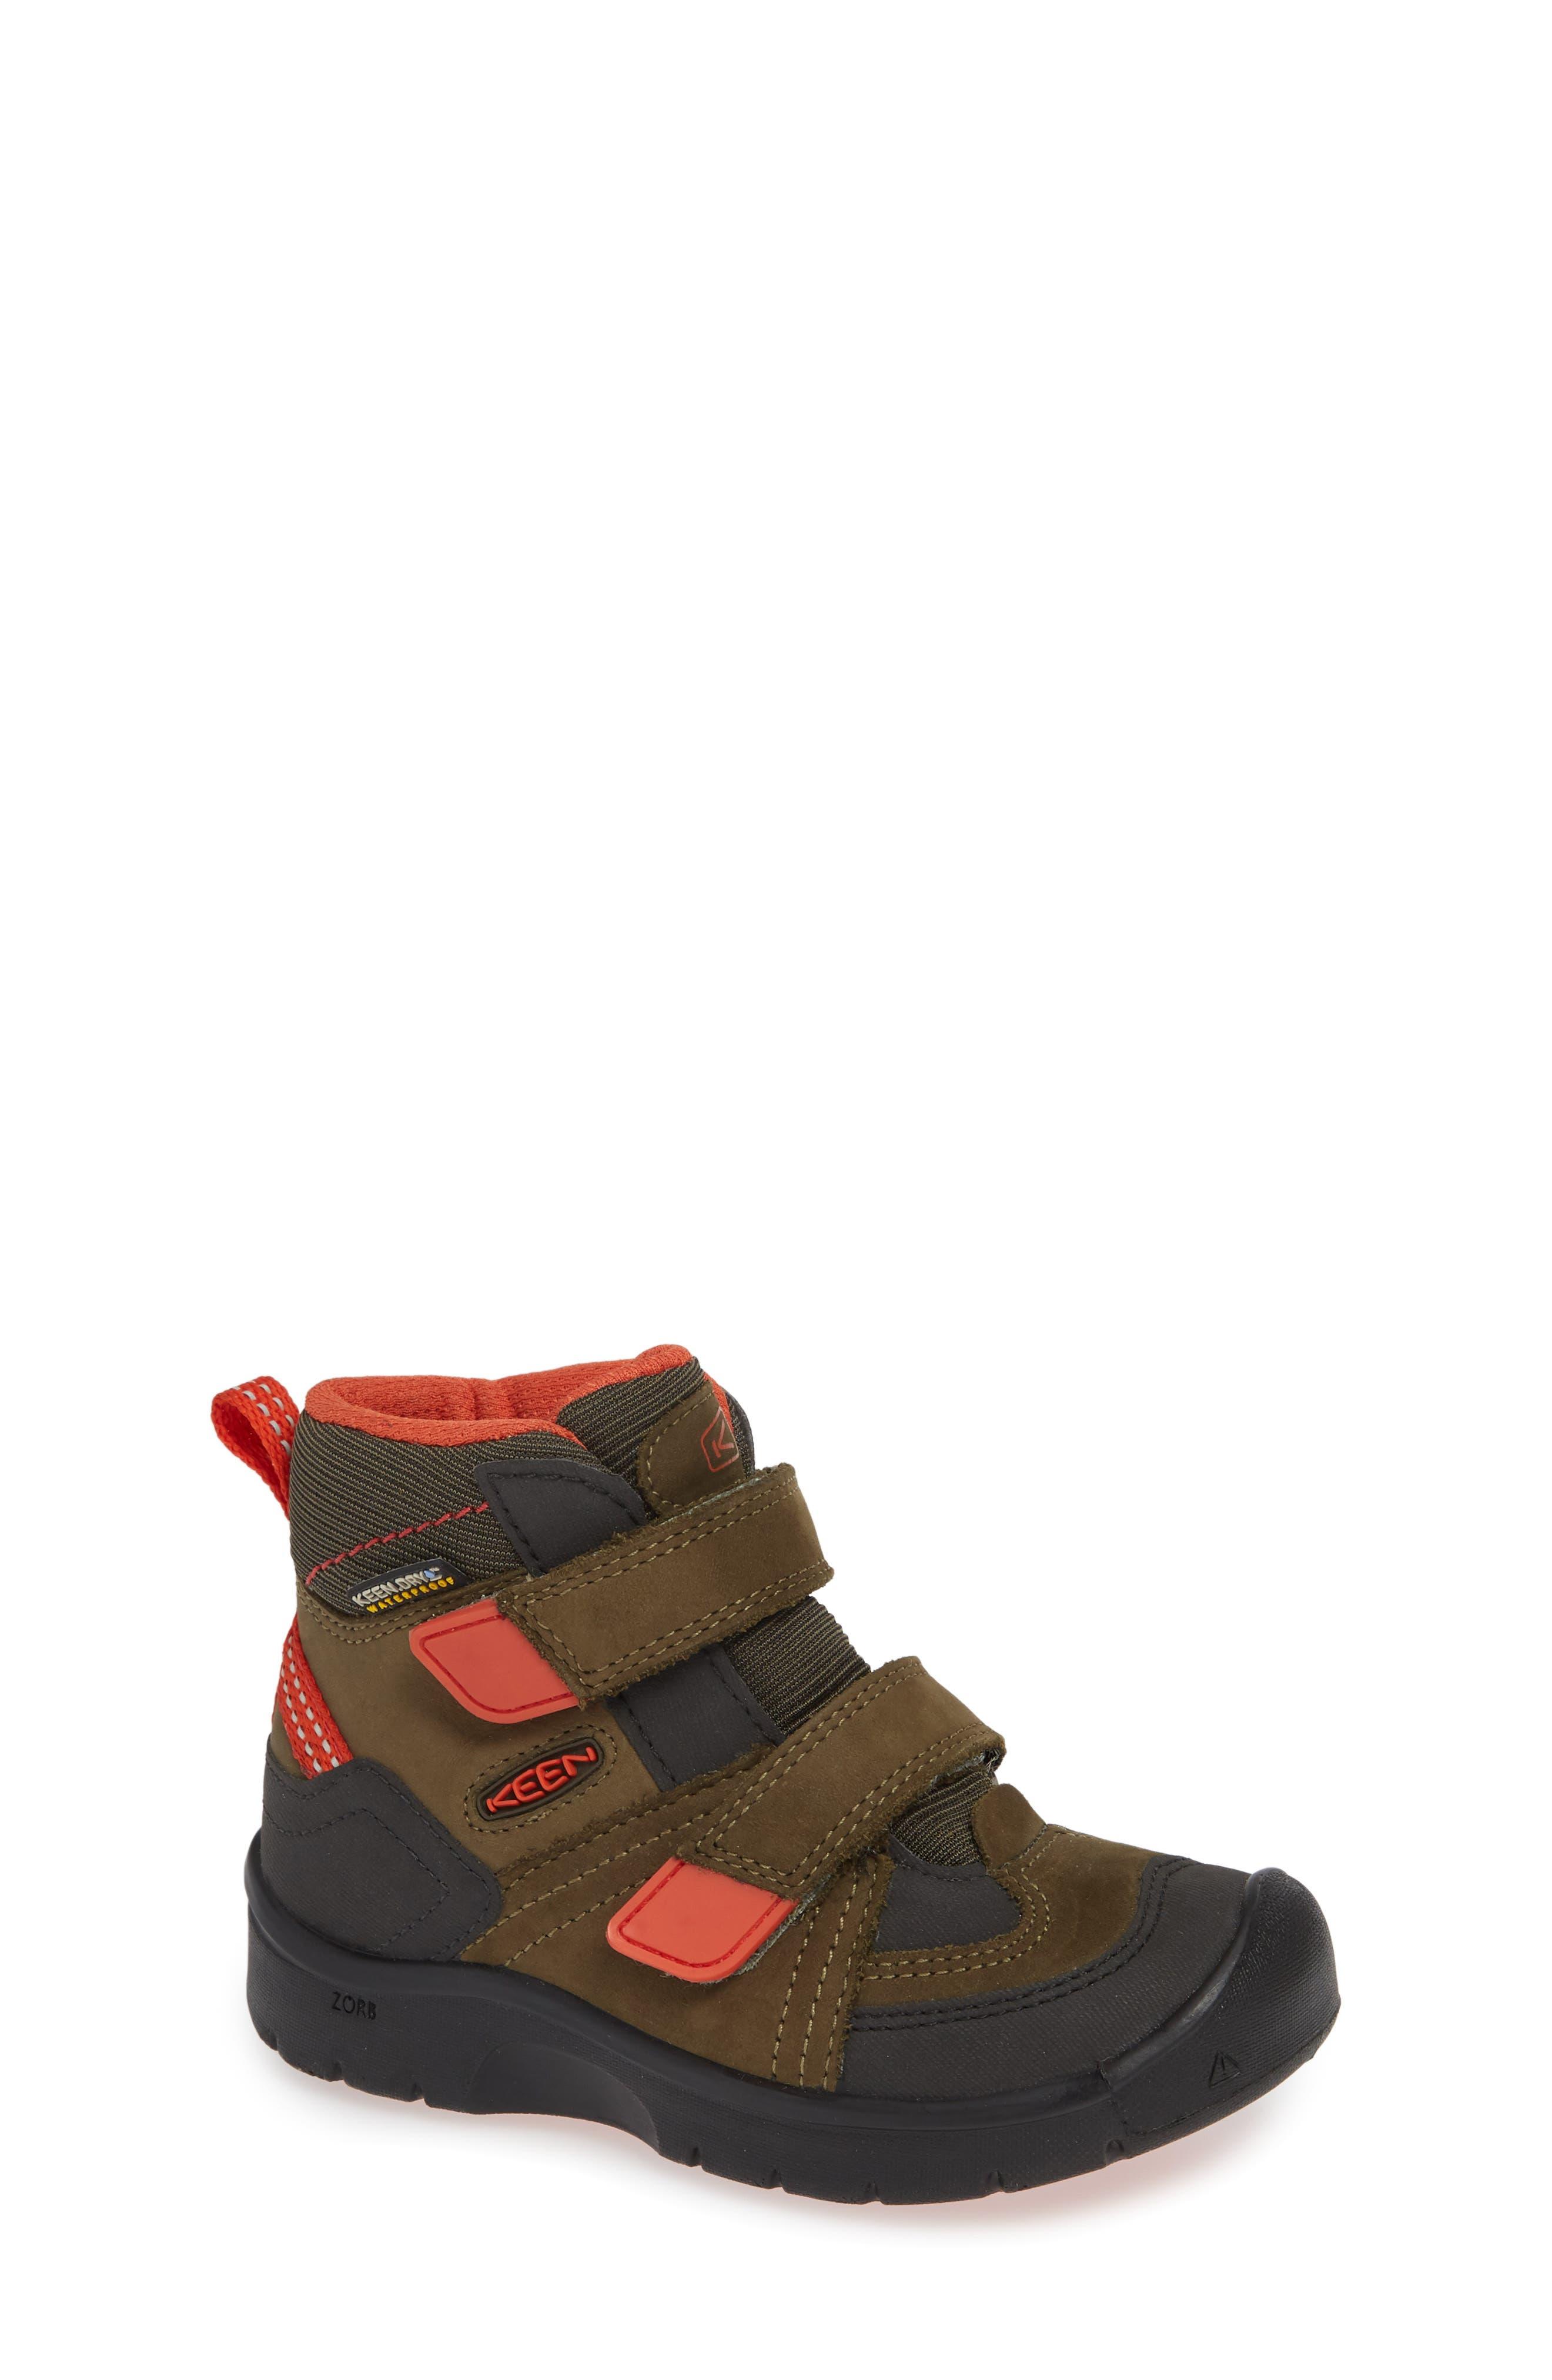 Hikeport Strap Waterproof Mid Boot,                             Main thumbnail 2, color,